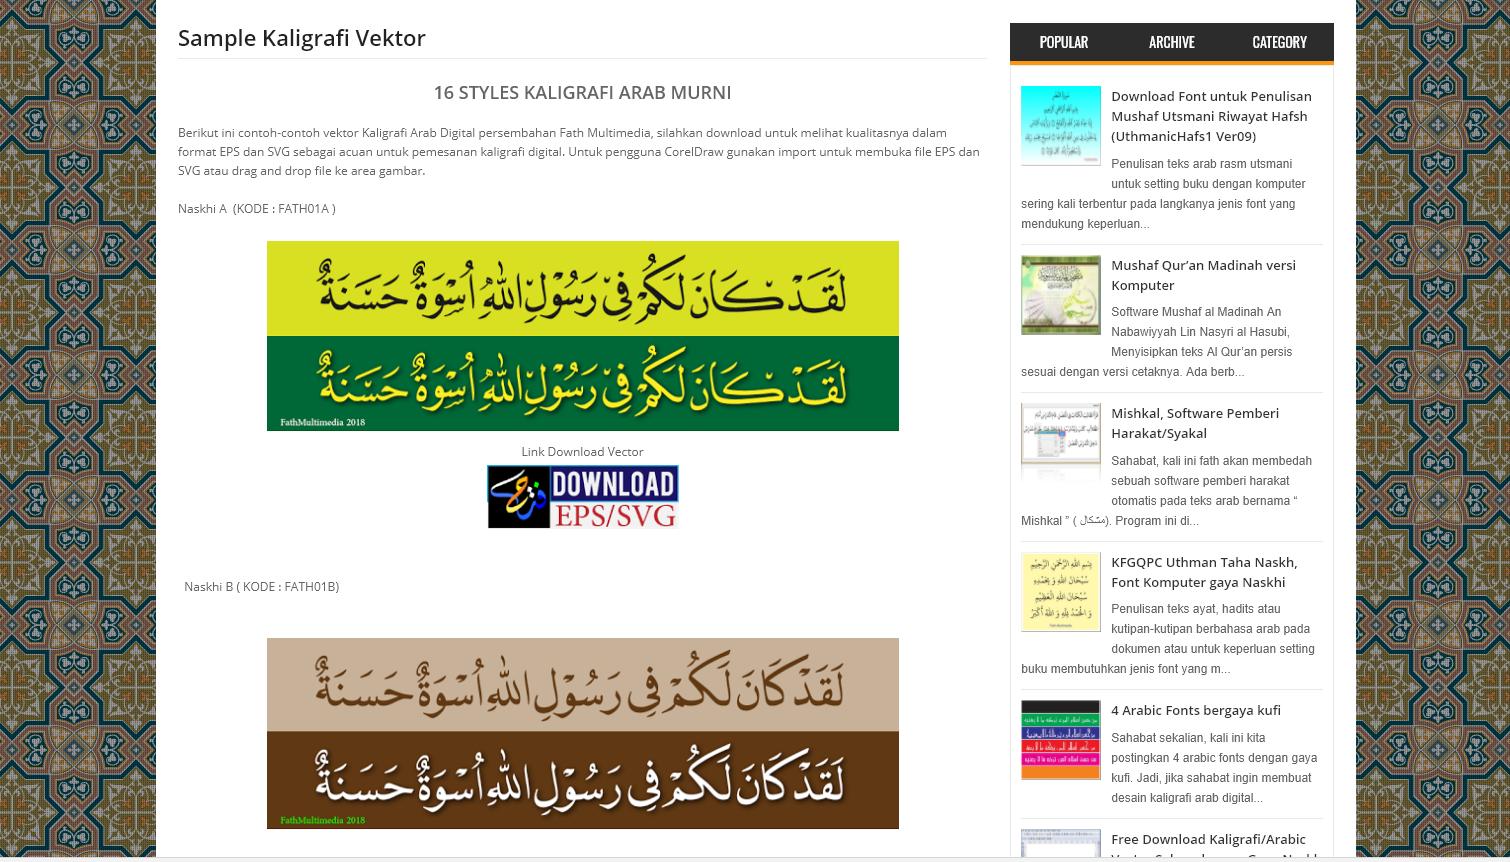 Download Vector Kaligrafi Murni Spesialis Desain Grafis